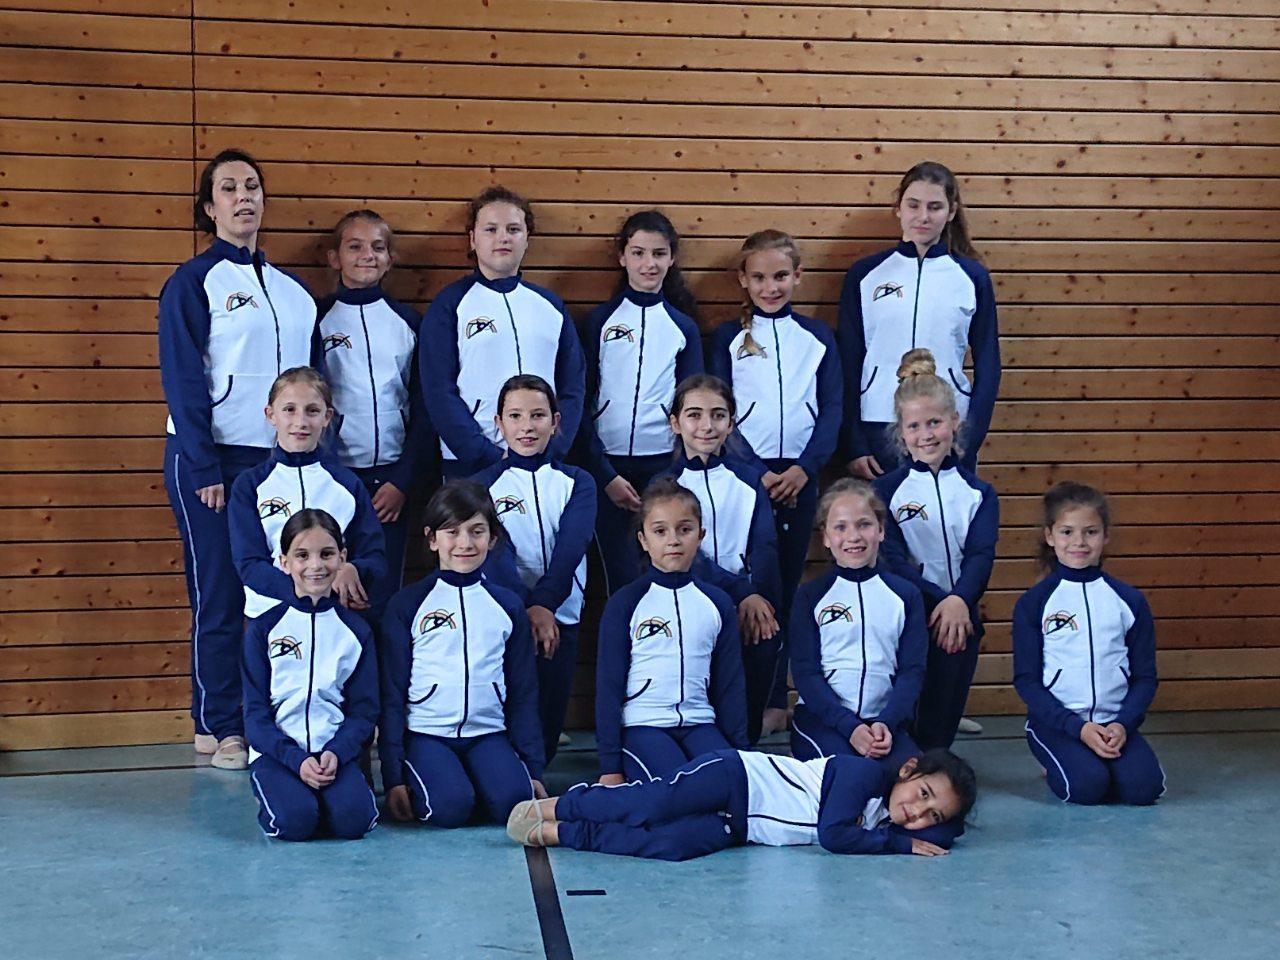 Команда гимнасток из Германии в костюмах от Ninelle Sport